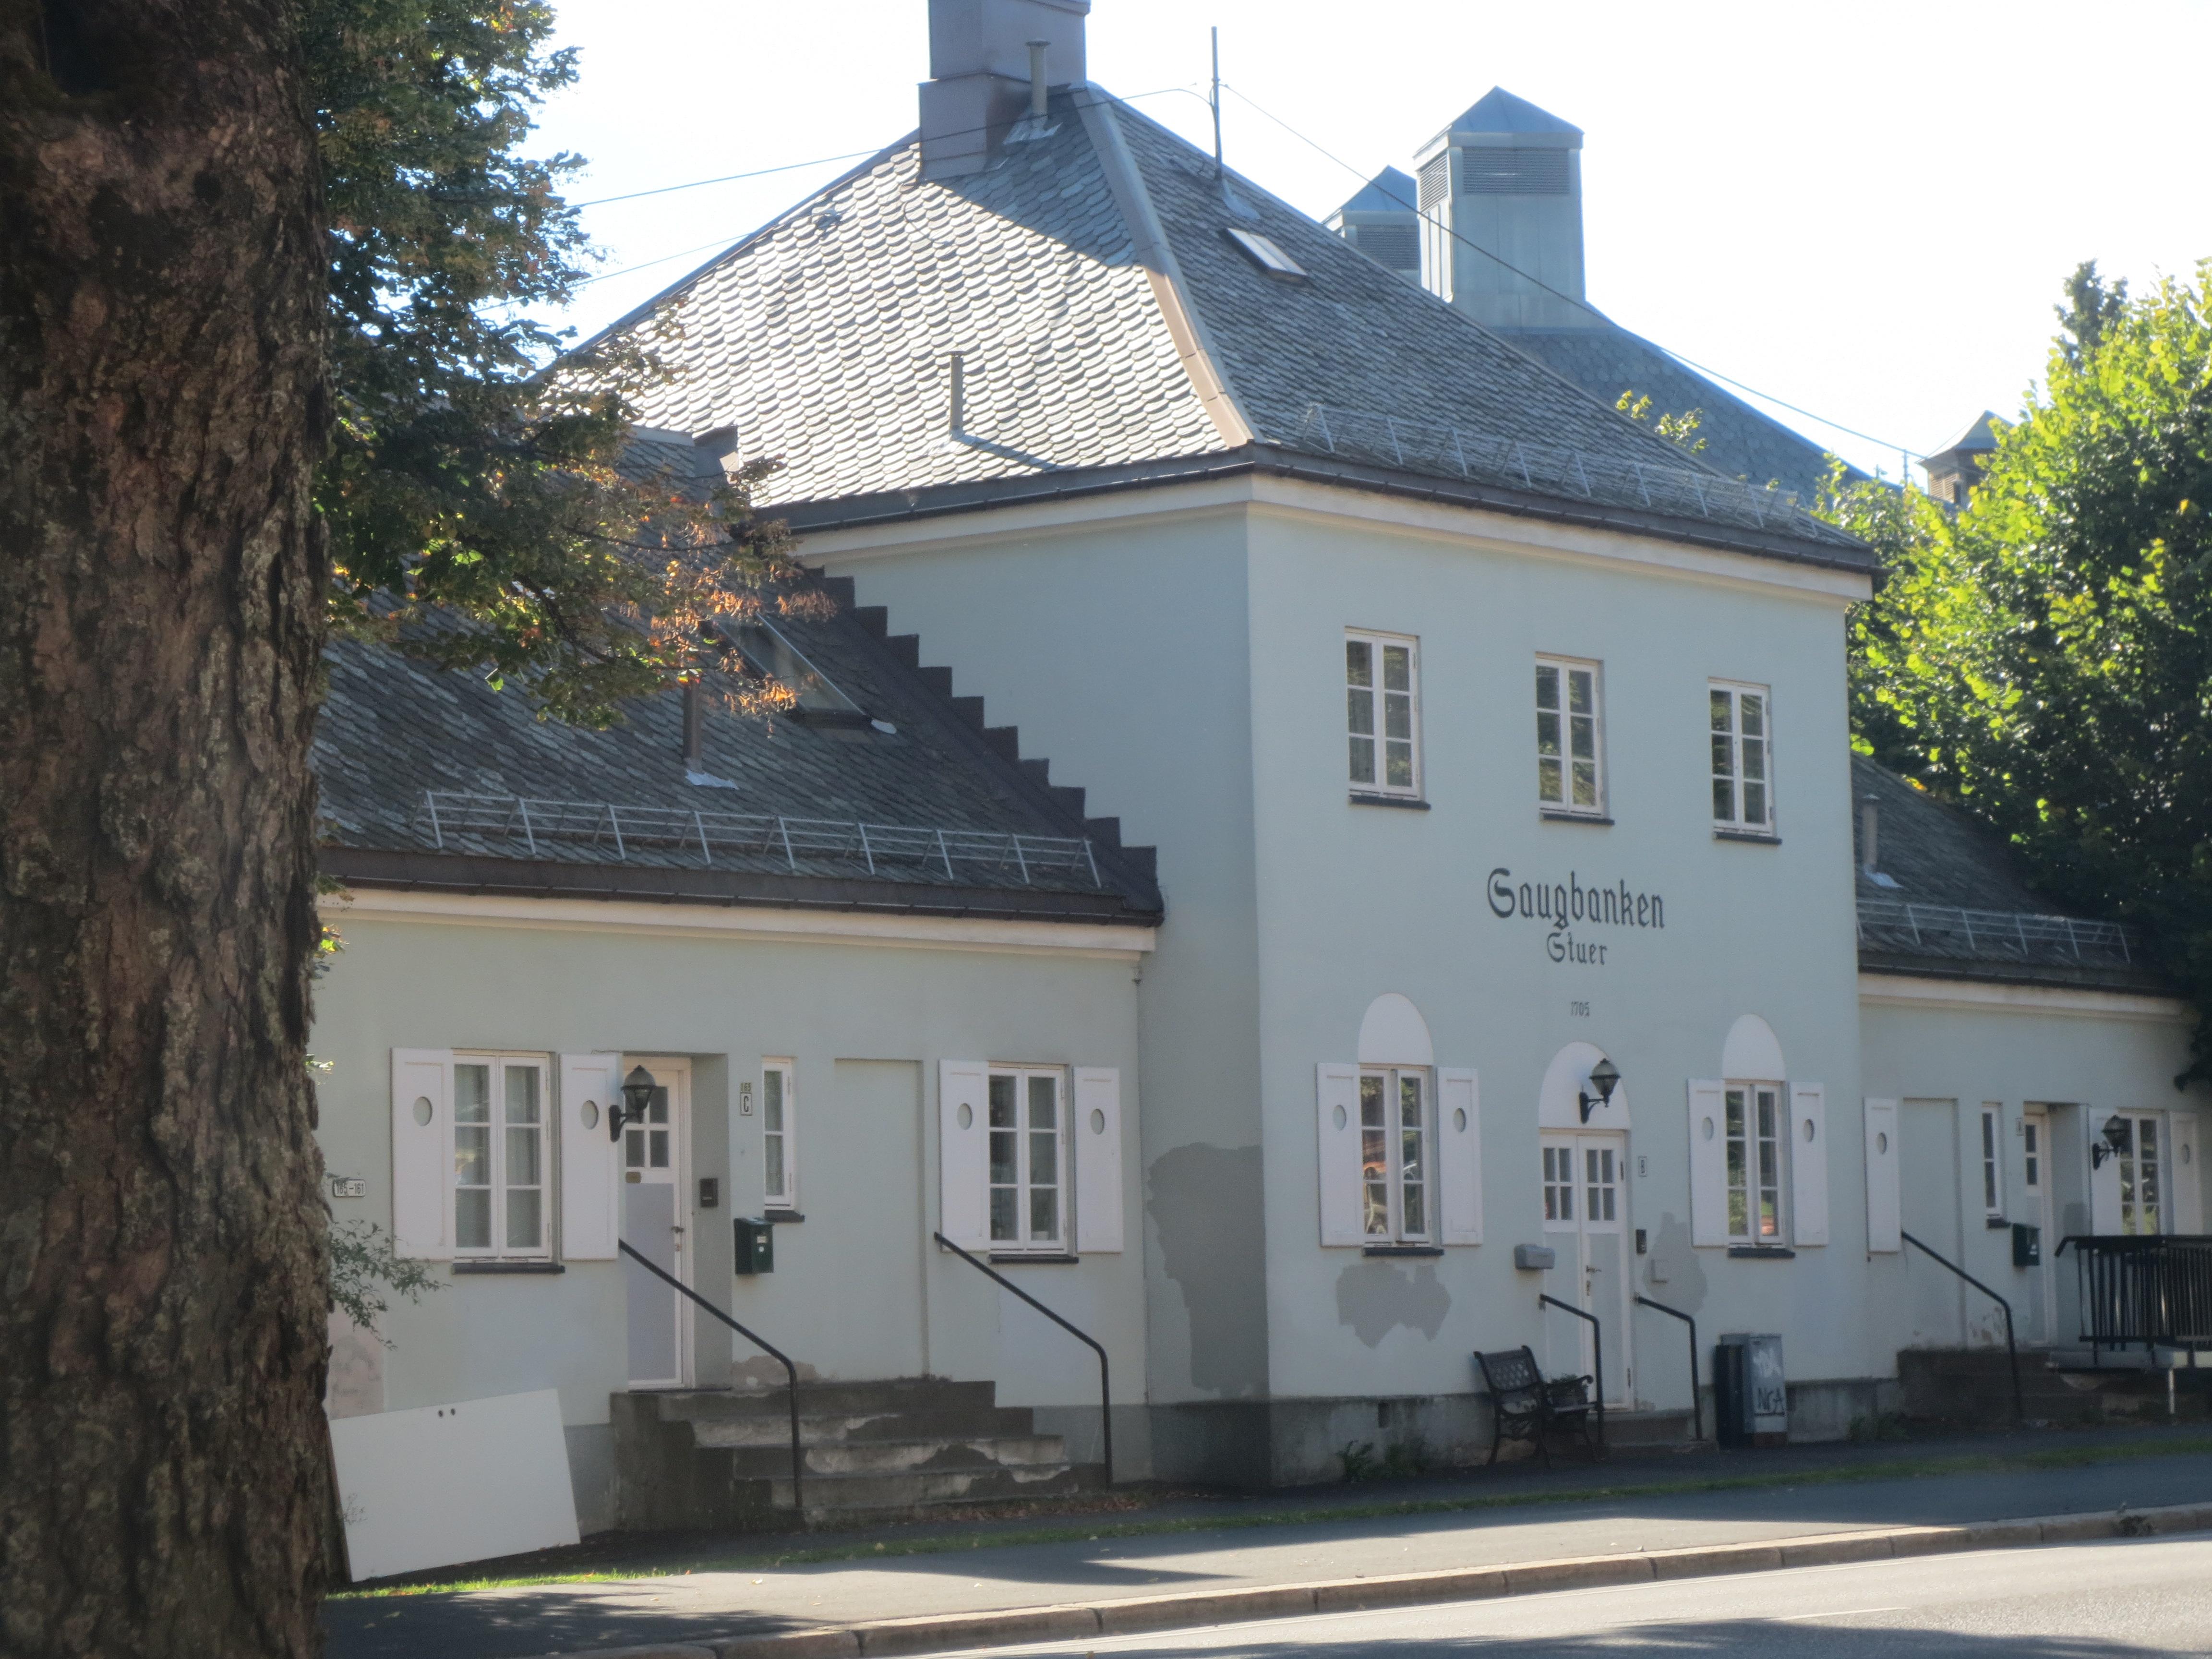 File:Saugbankens stuer IMG 0179.JPG - Wikimedia Commons